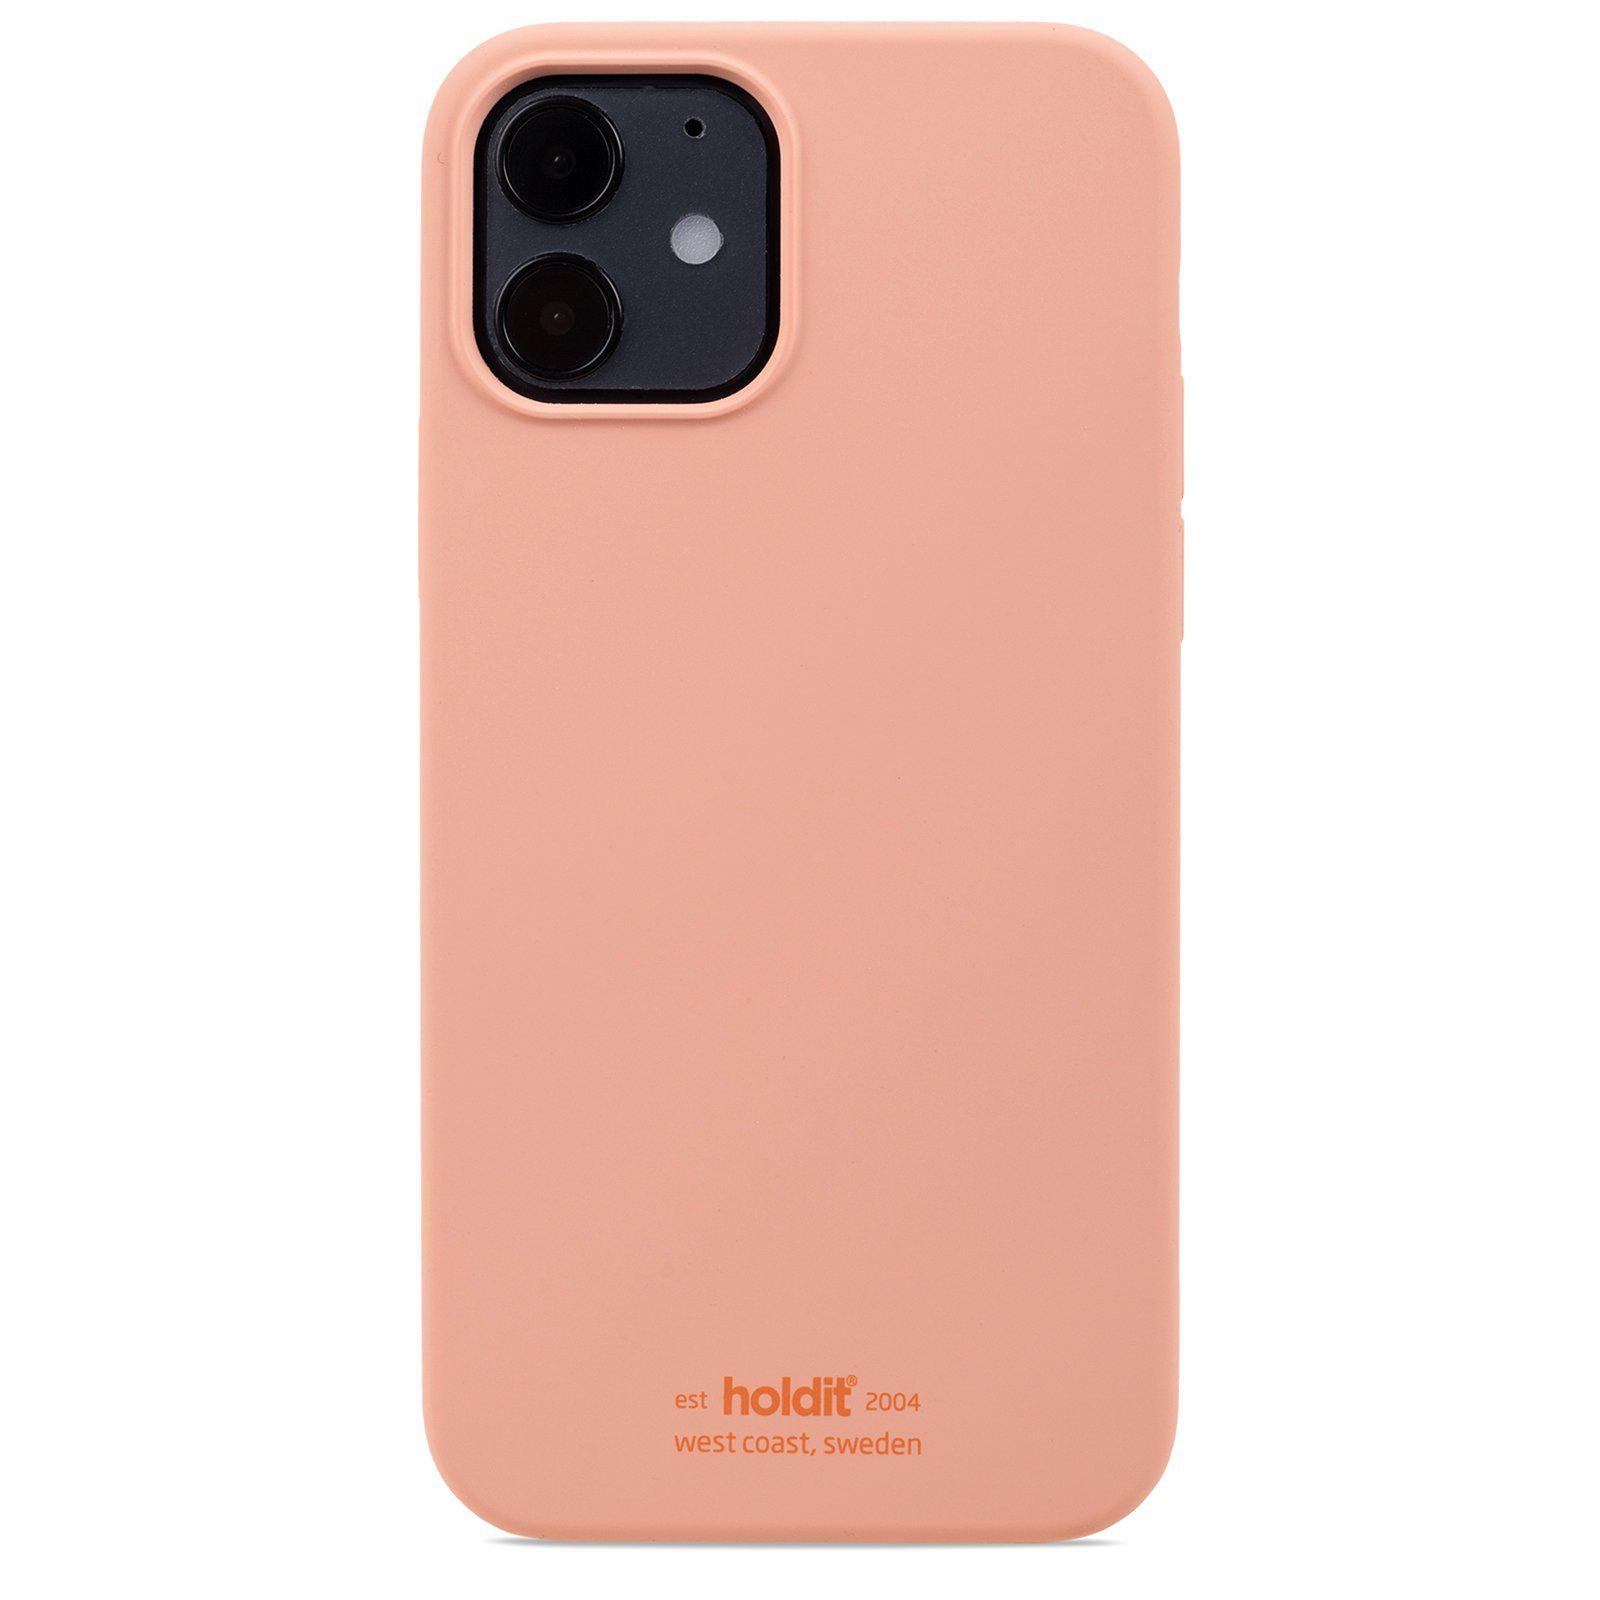 Silikonskal iPhone 12/12 Pro Pink Peach